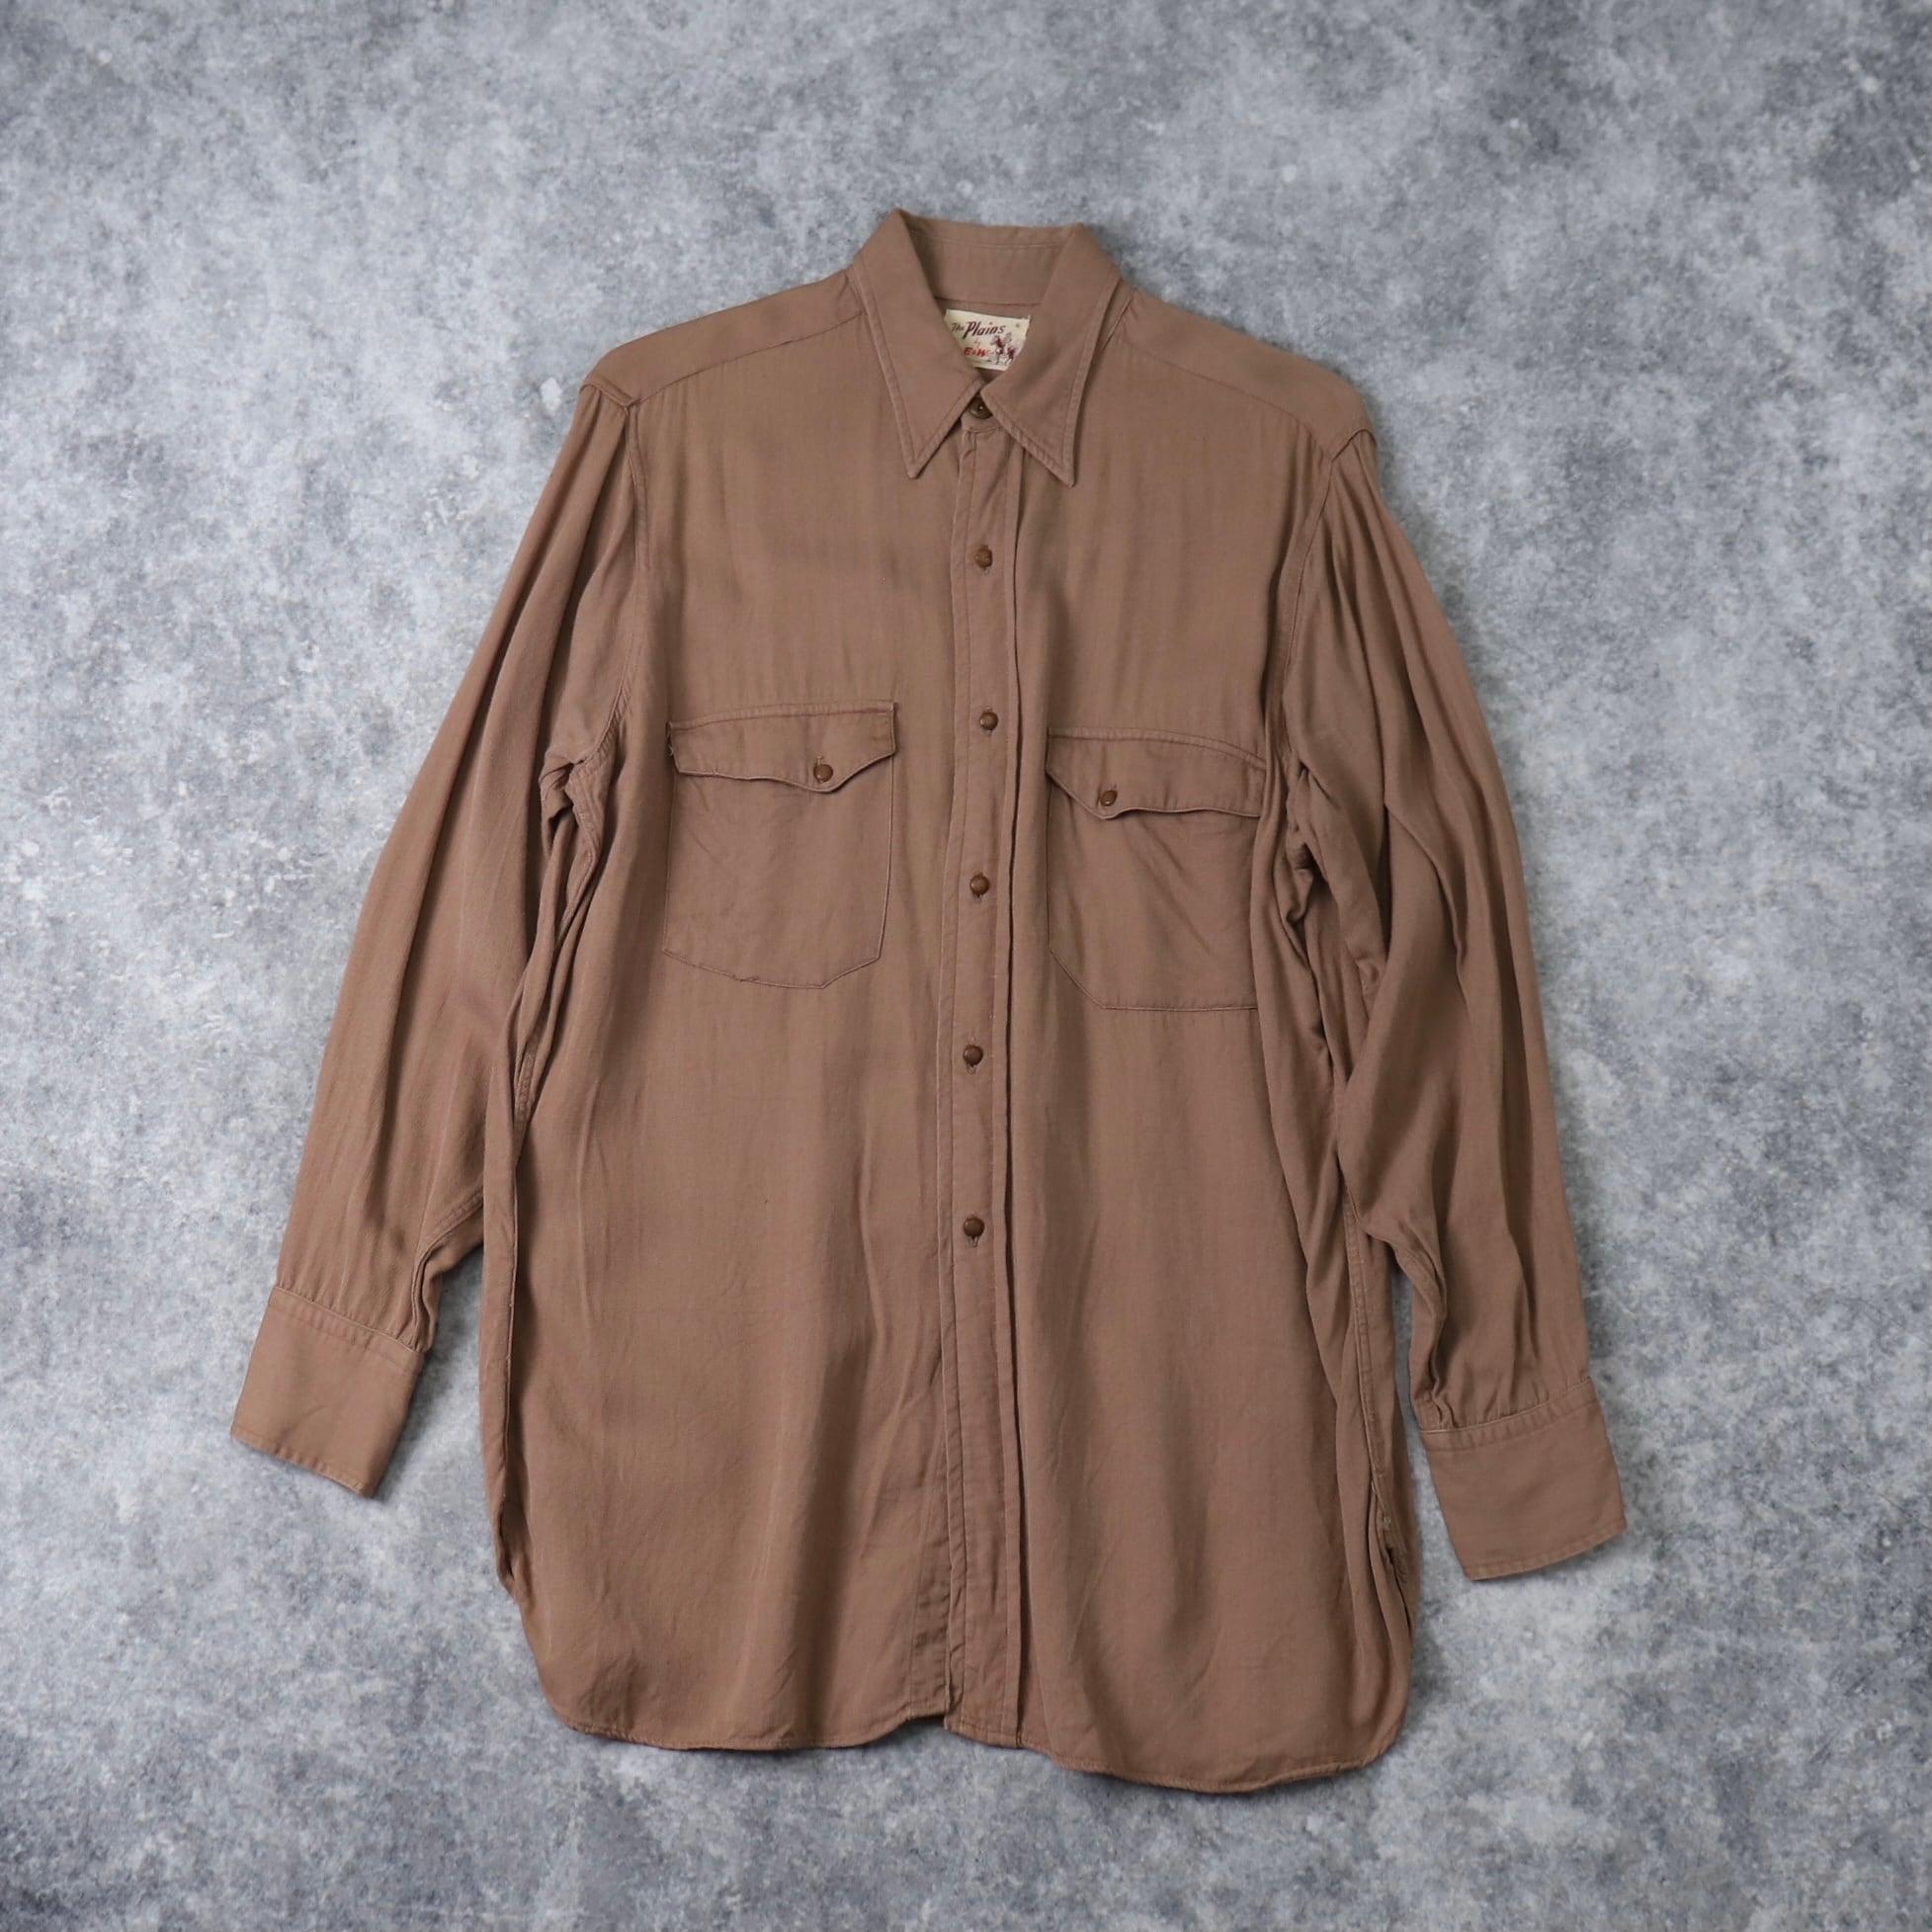 50's  ''The Plains by E&W'' Gabardine Shirts ギャバシャツ ギャバジンシャツ ウエスタンシャツ ビンテージシャツ A554